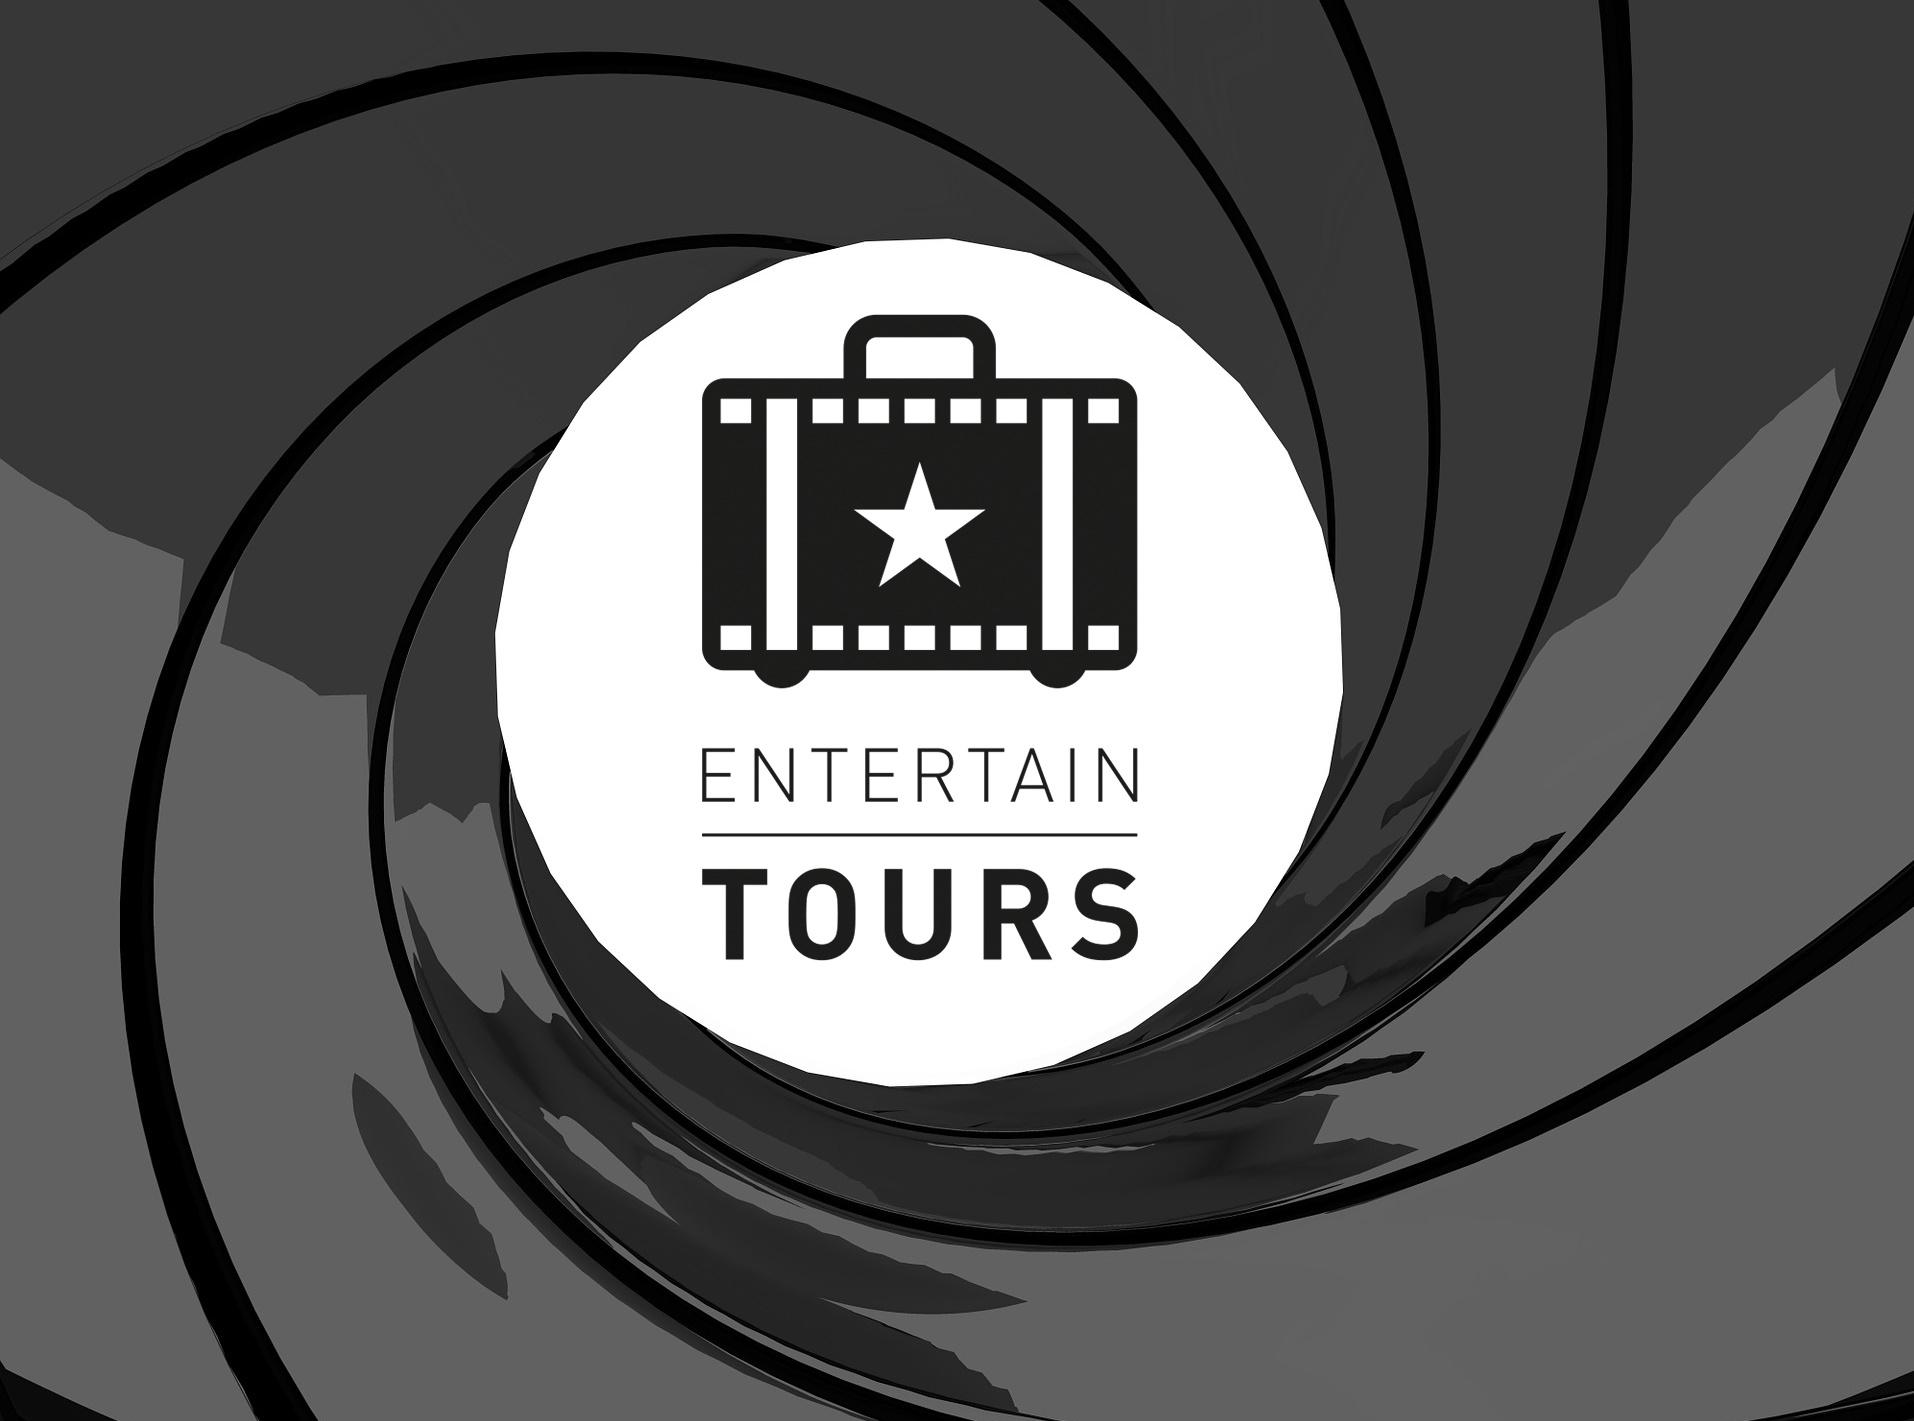 James Bond London Entertain Tours